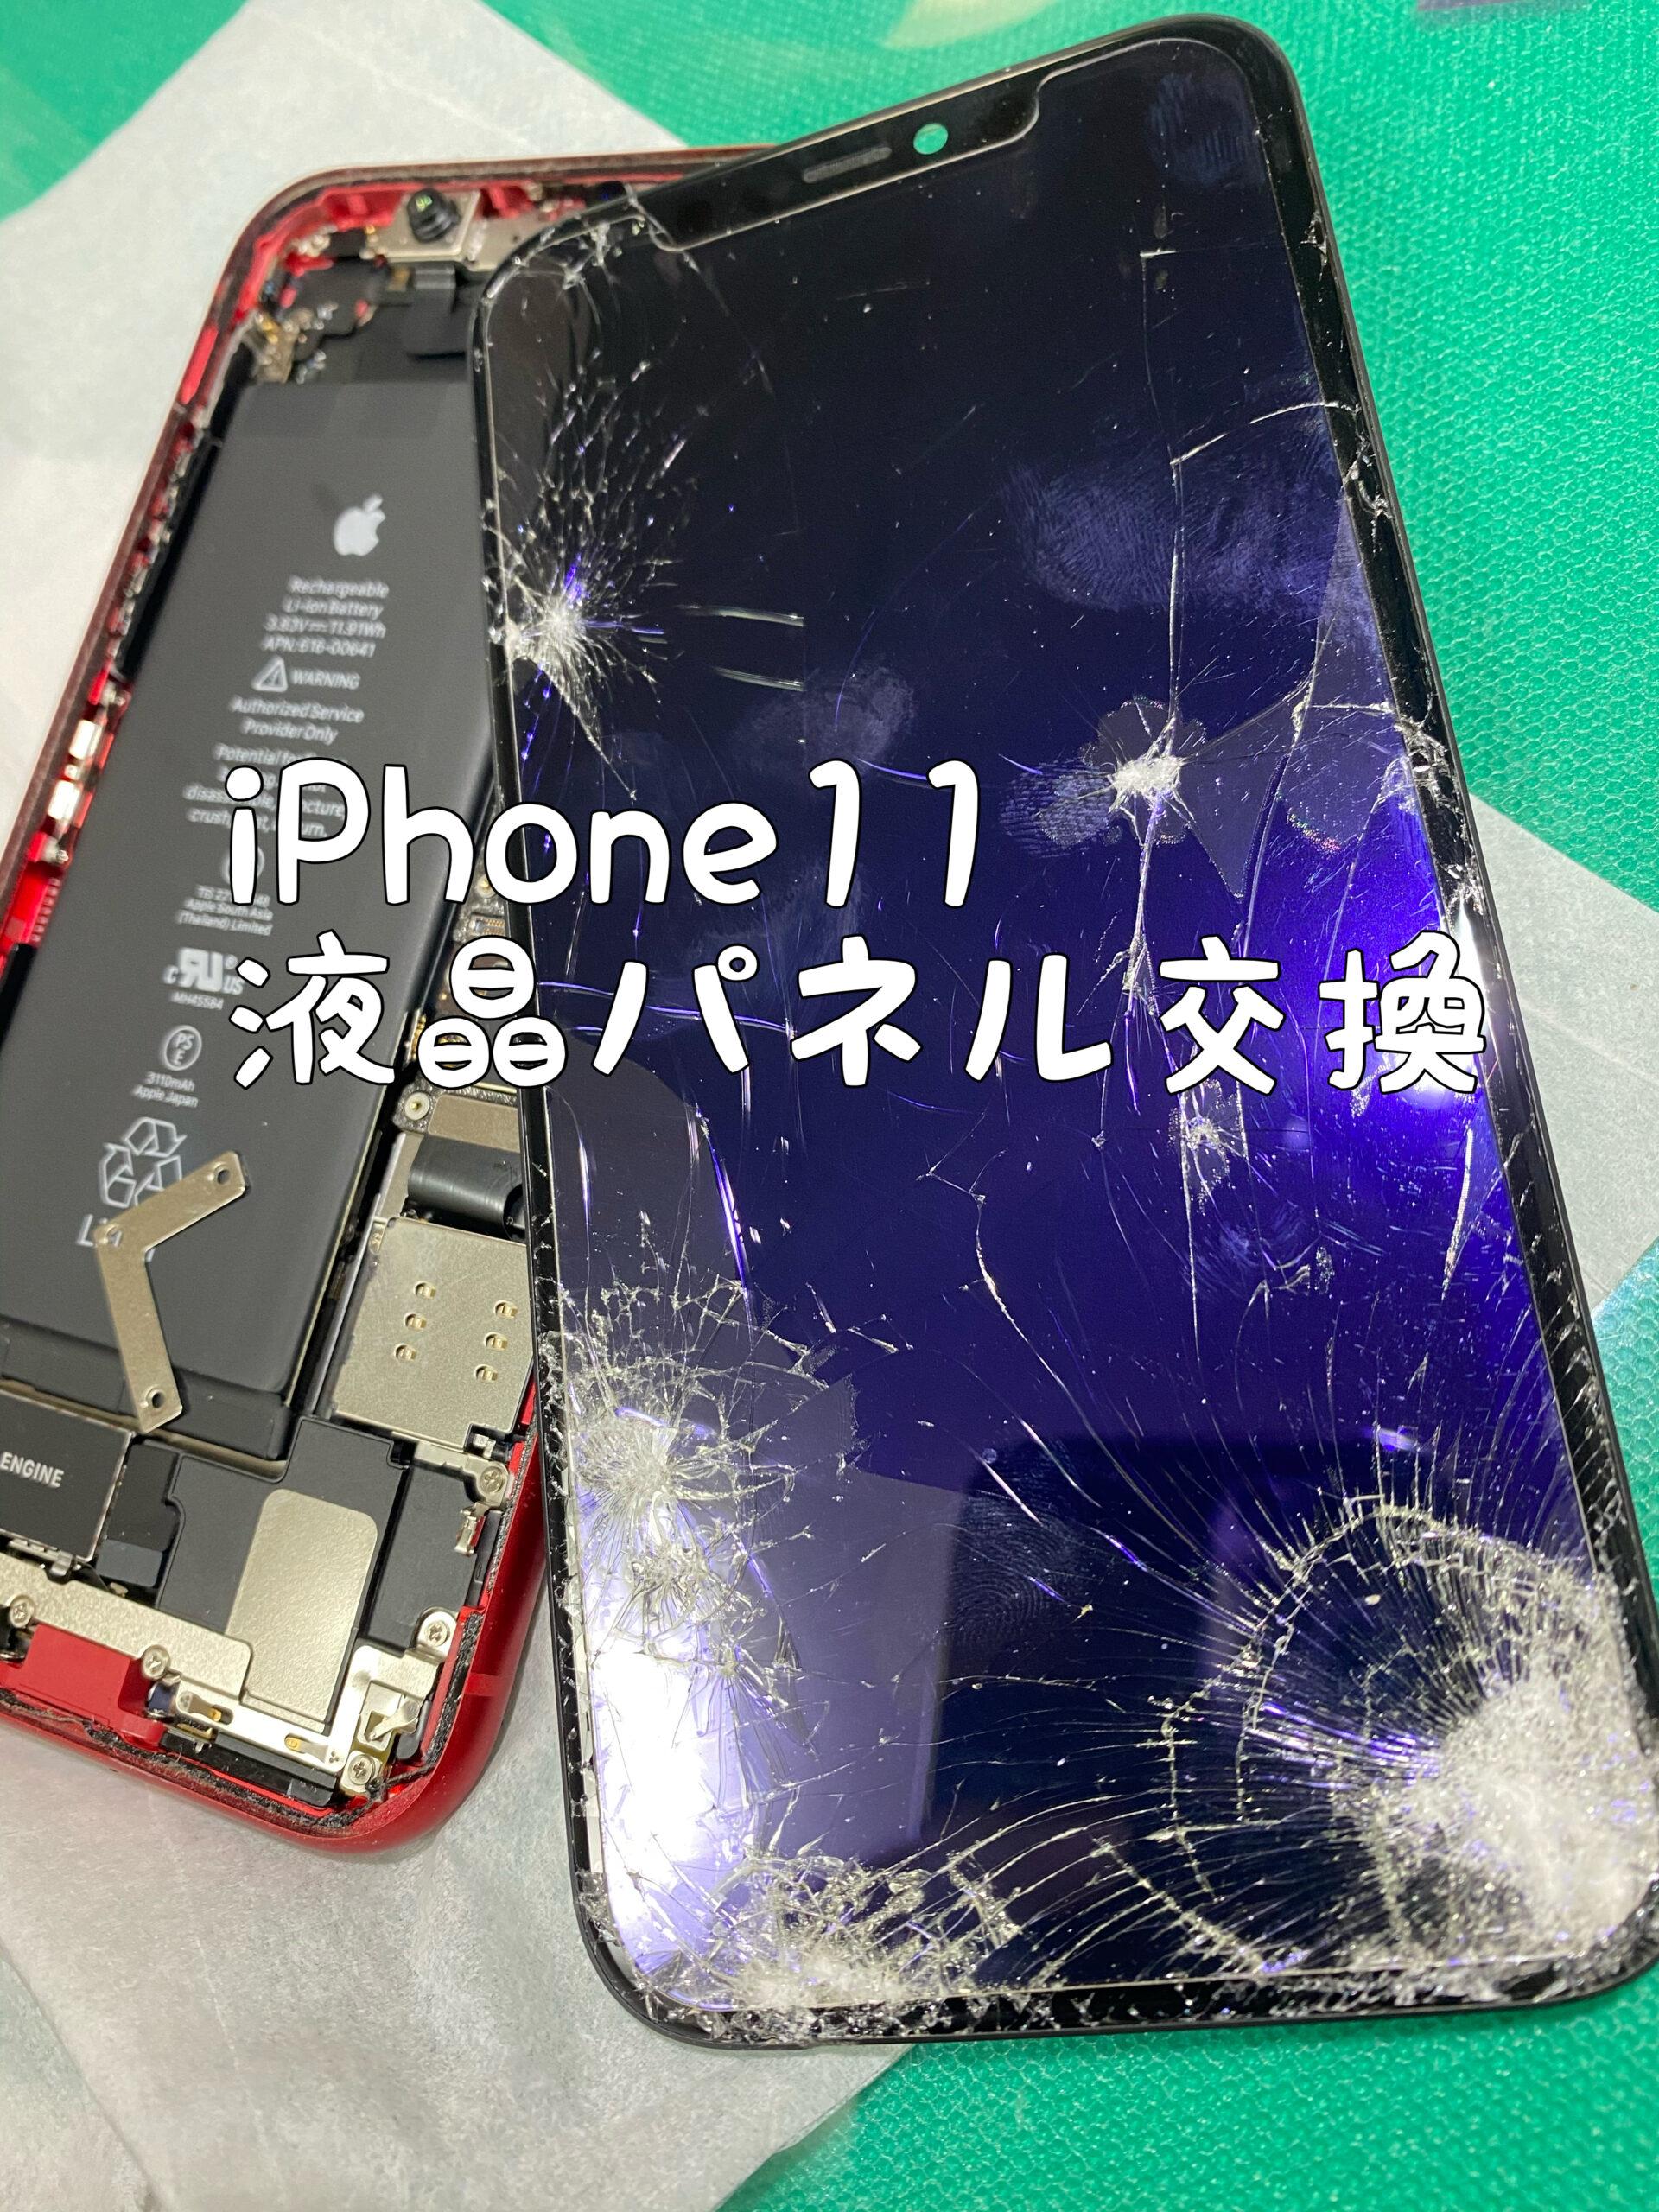 iPhone修理 アイフォン修理 画面割れ ひび割れ 液晶 iPhone11 江南市 犬山市